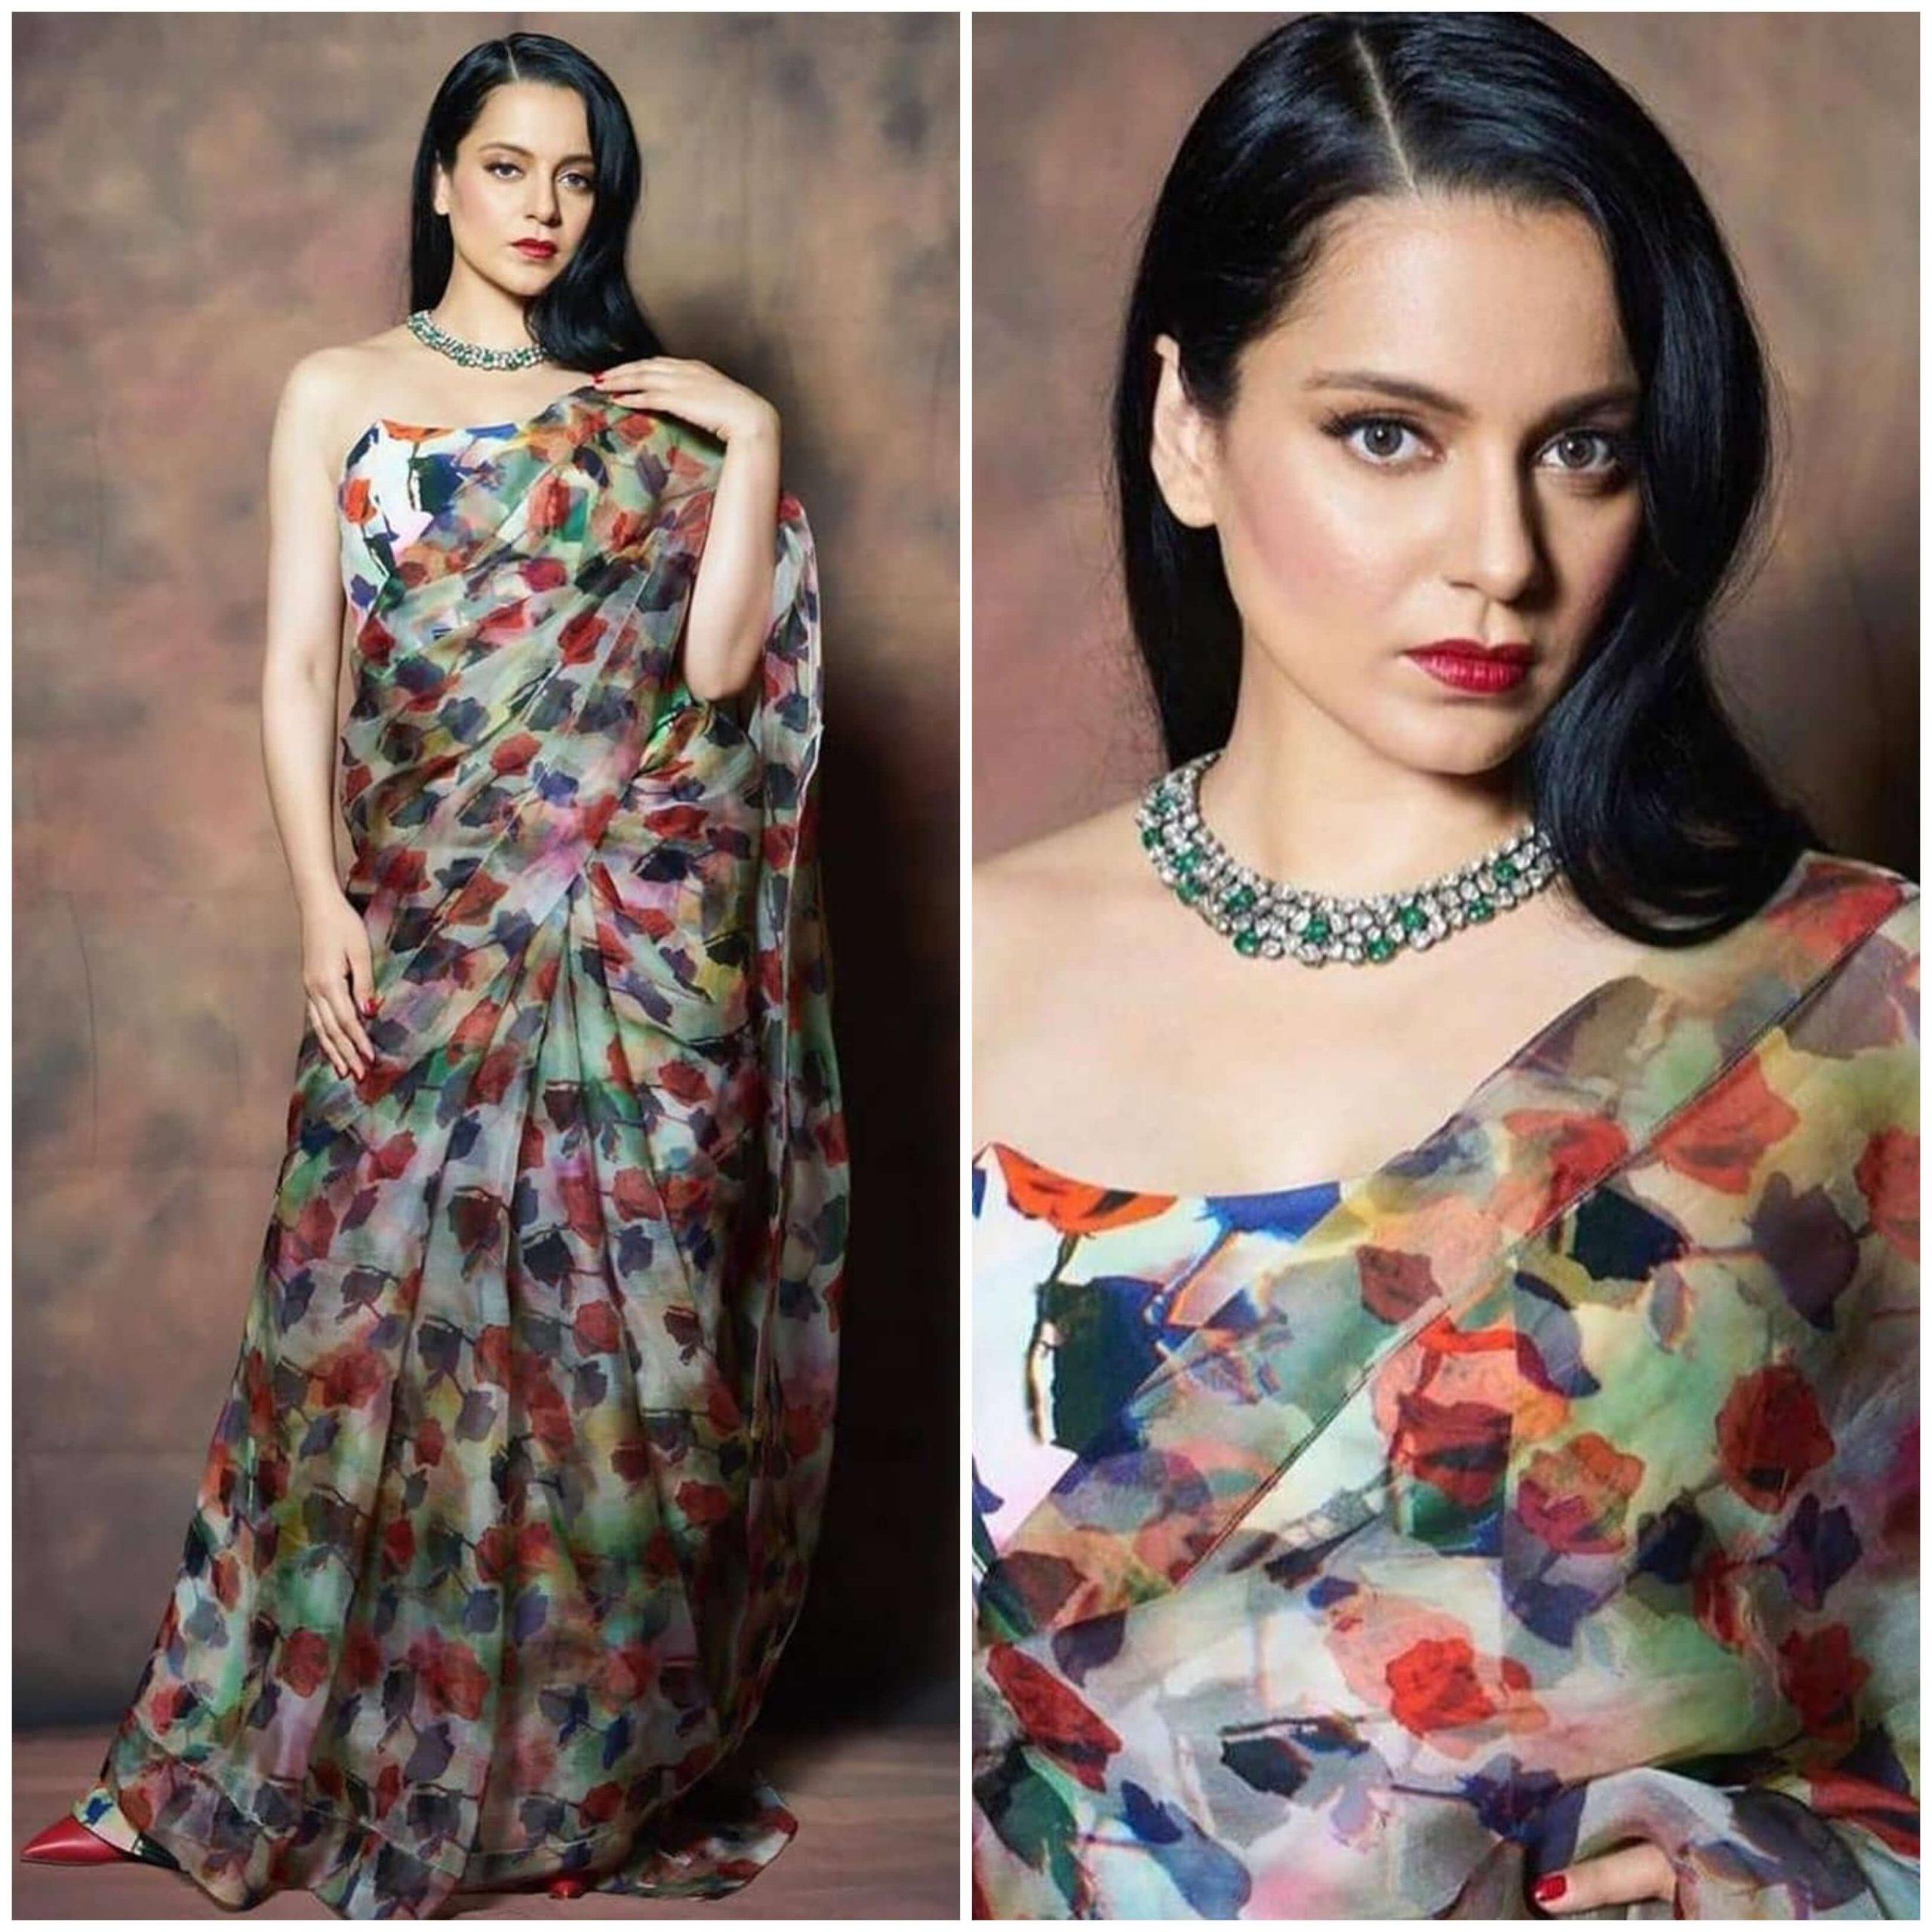 Kangana Ranaut beautiful Floral Print Designer Dresses